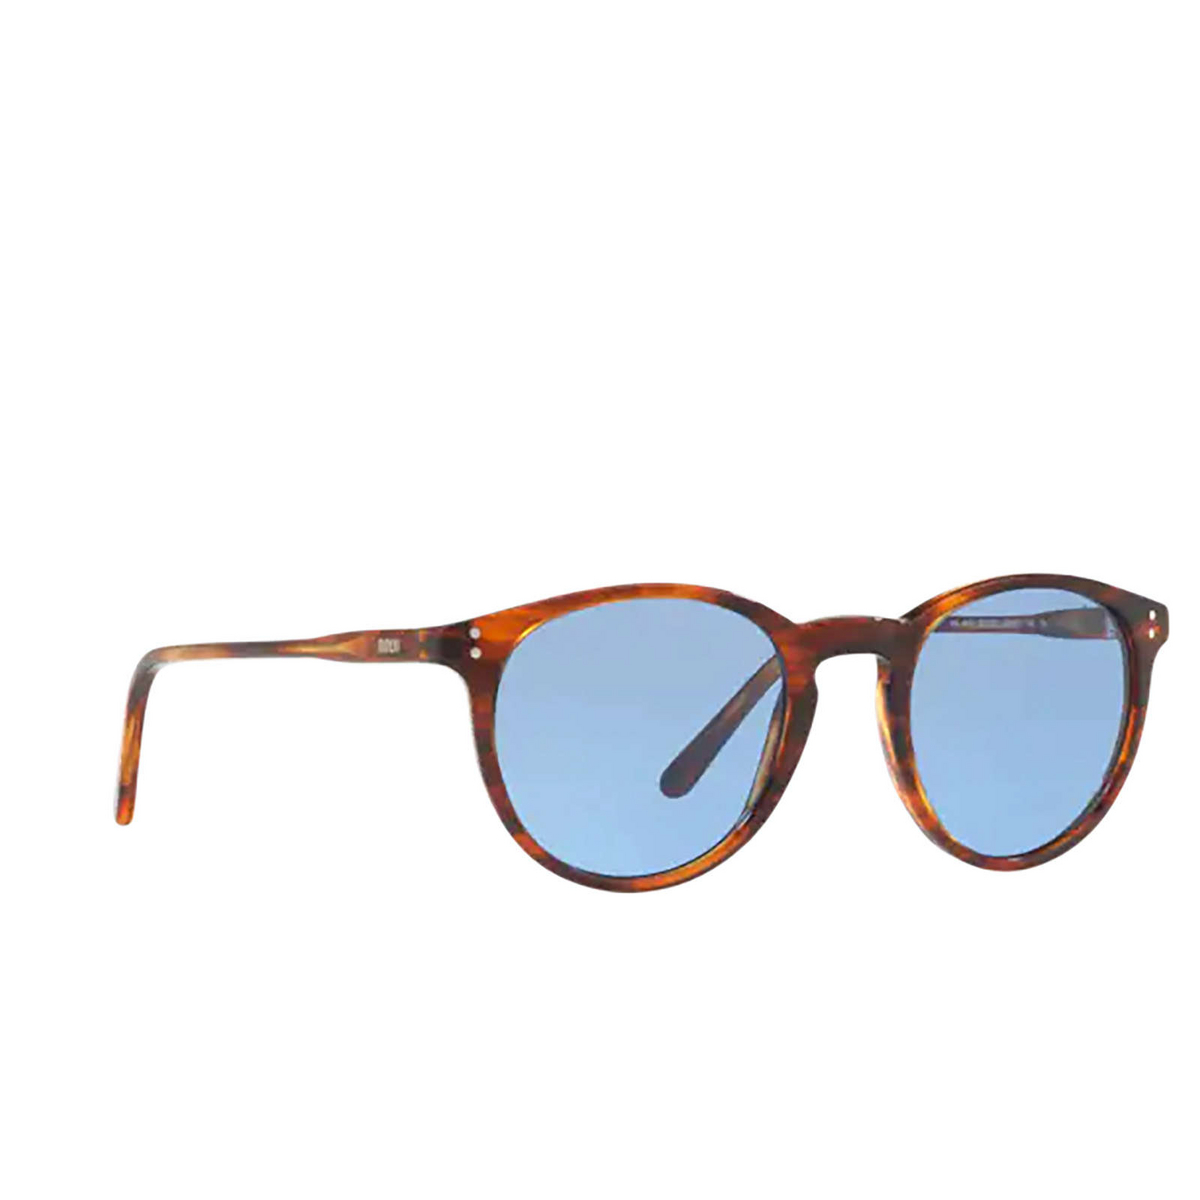 Polo Ralph Lauren® Round Sunglasses: PH4110 color Shiny Striped Havana 500772 - three-quarters view.